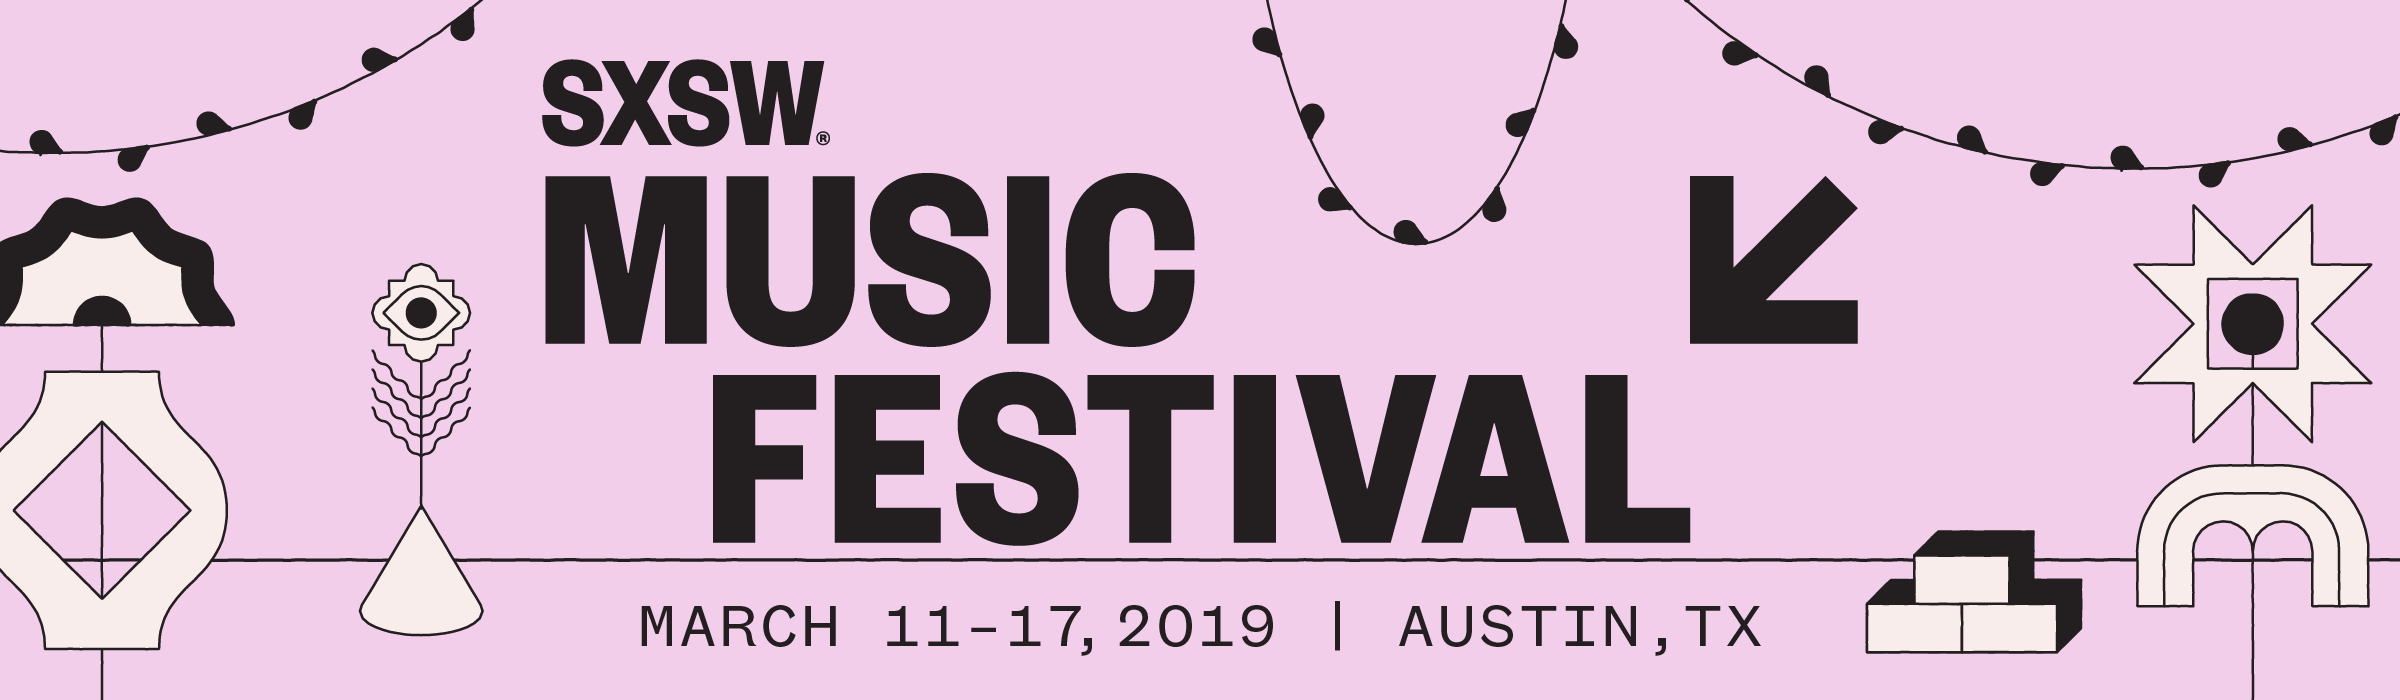 19_SXSW_Music Festival_Header.png